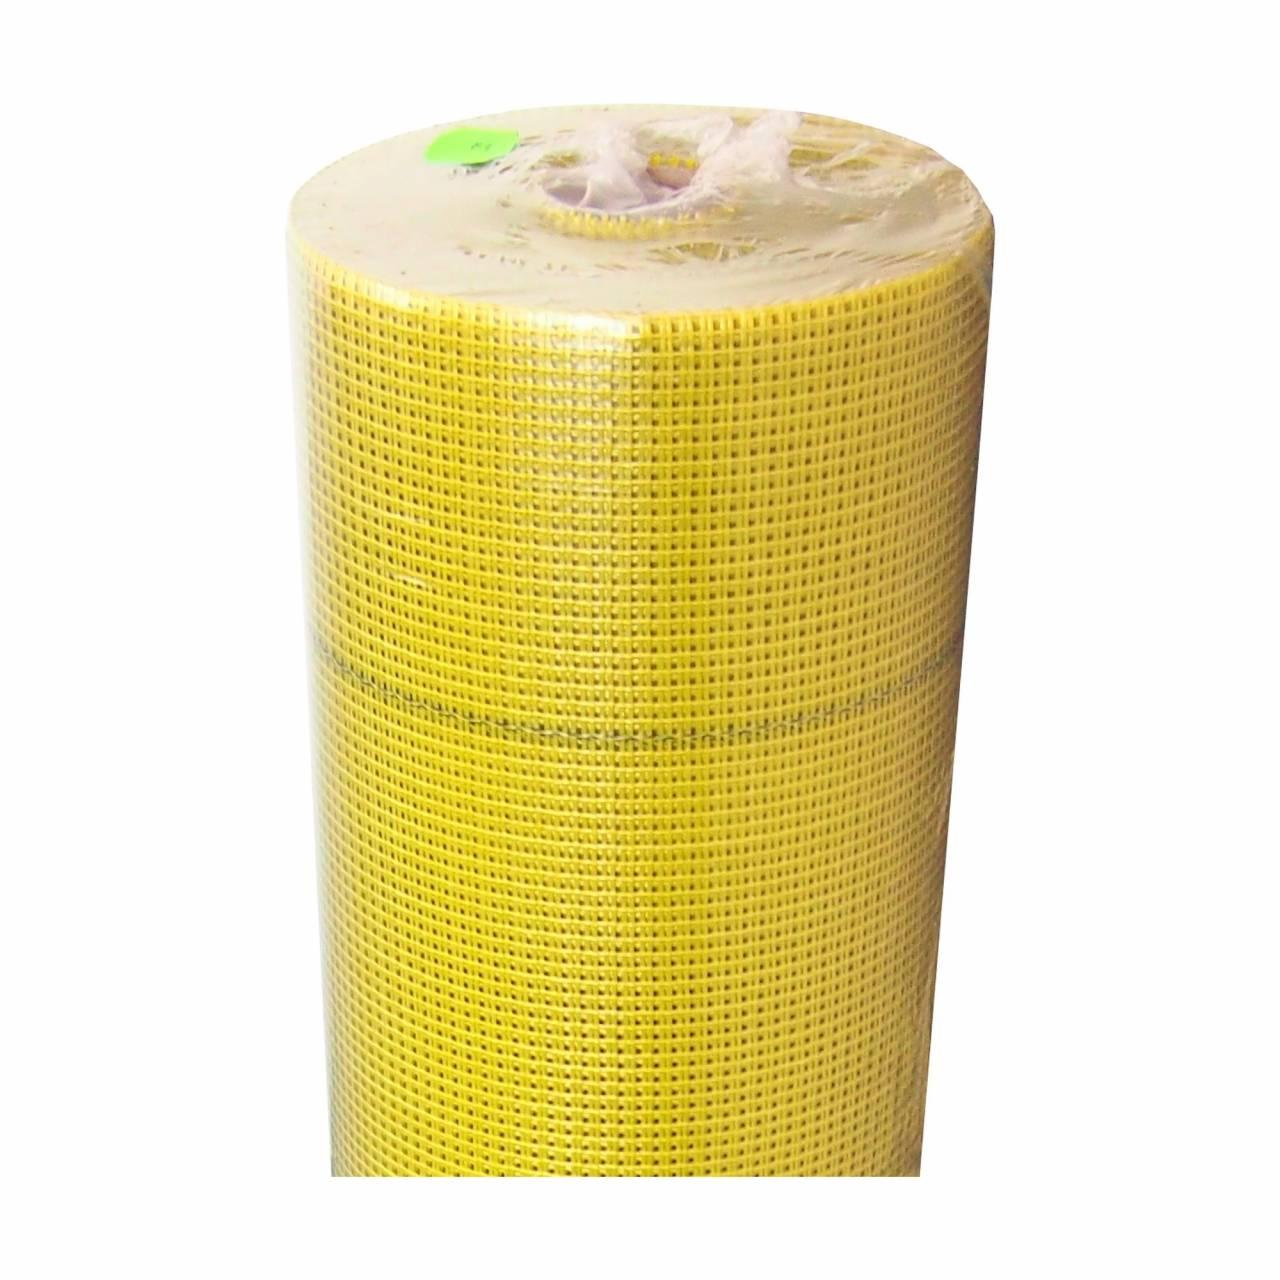 WDVS-Putzgewebe 4 x 4 olivgrün / Rolle 1,0 x 50 m